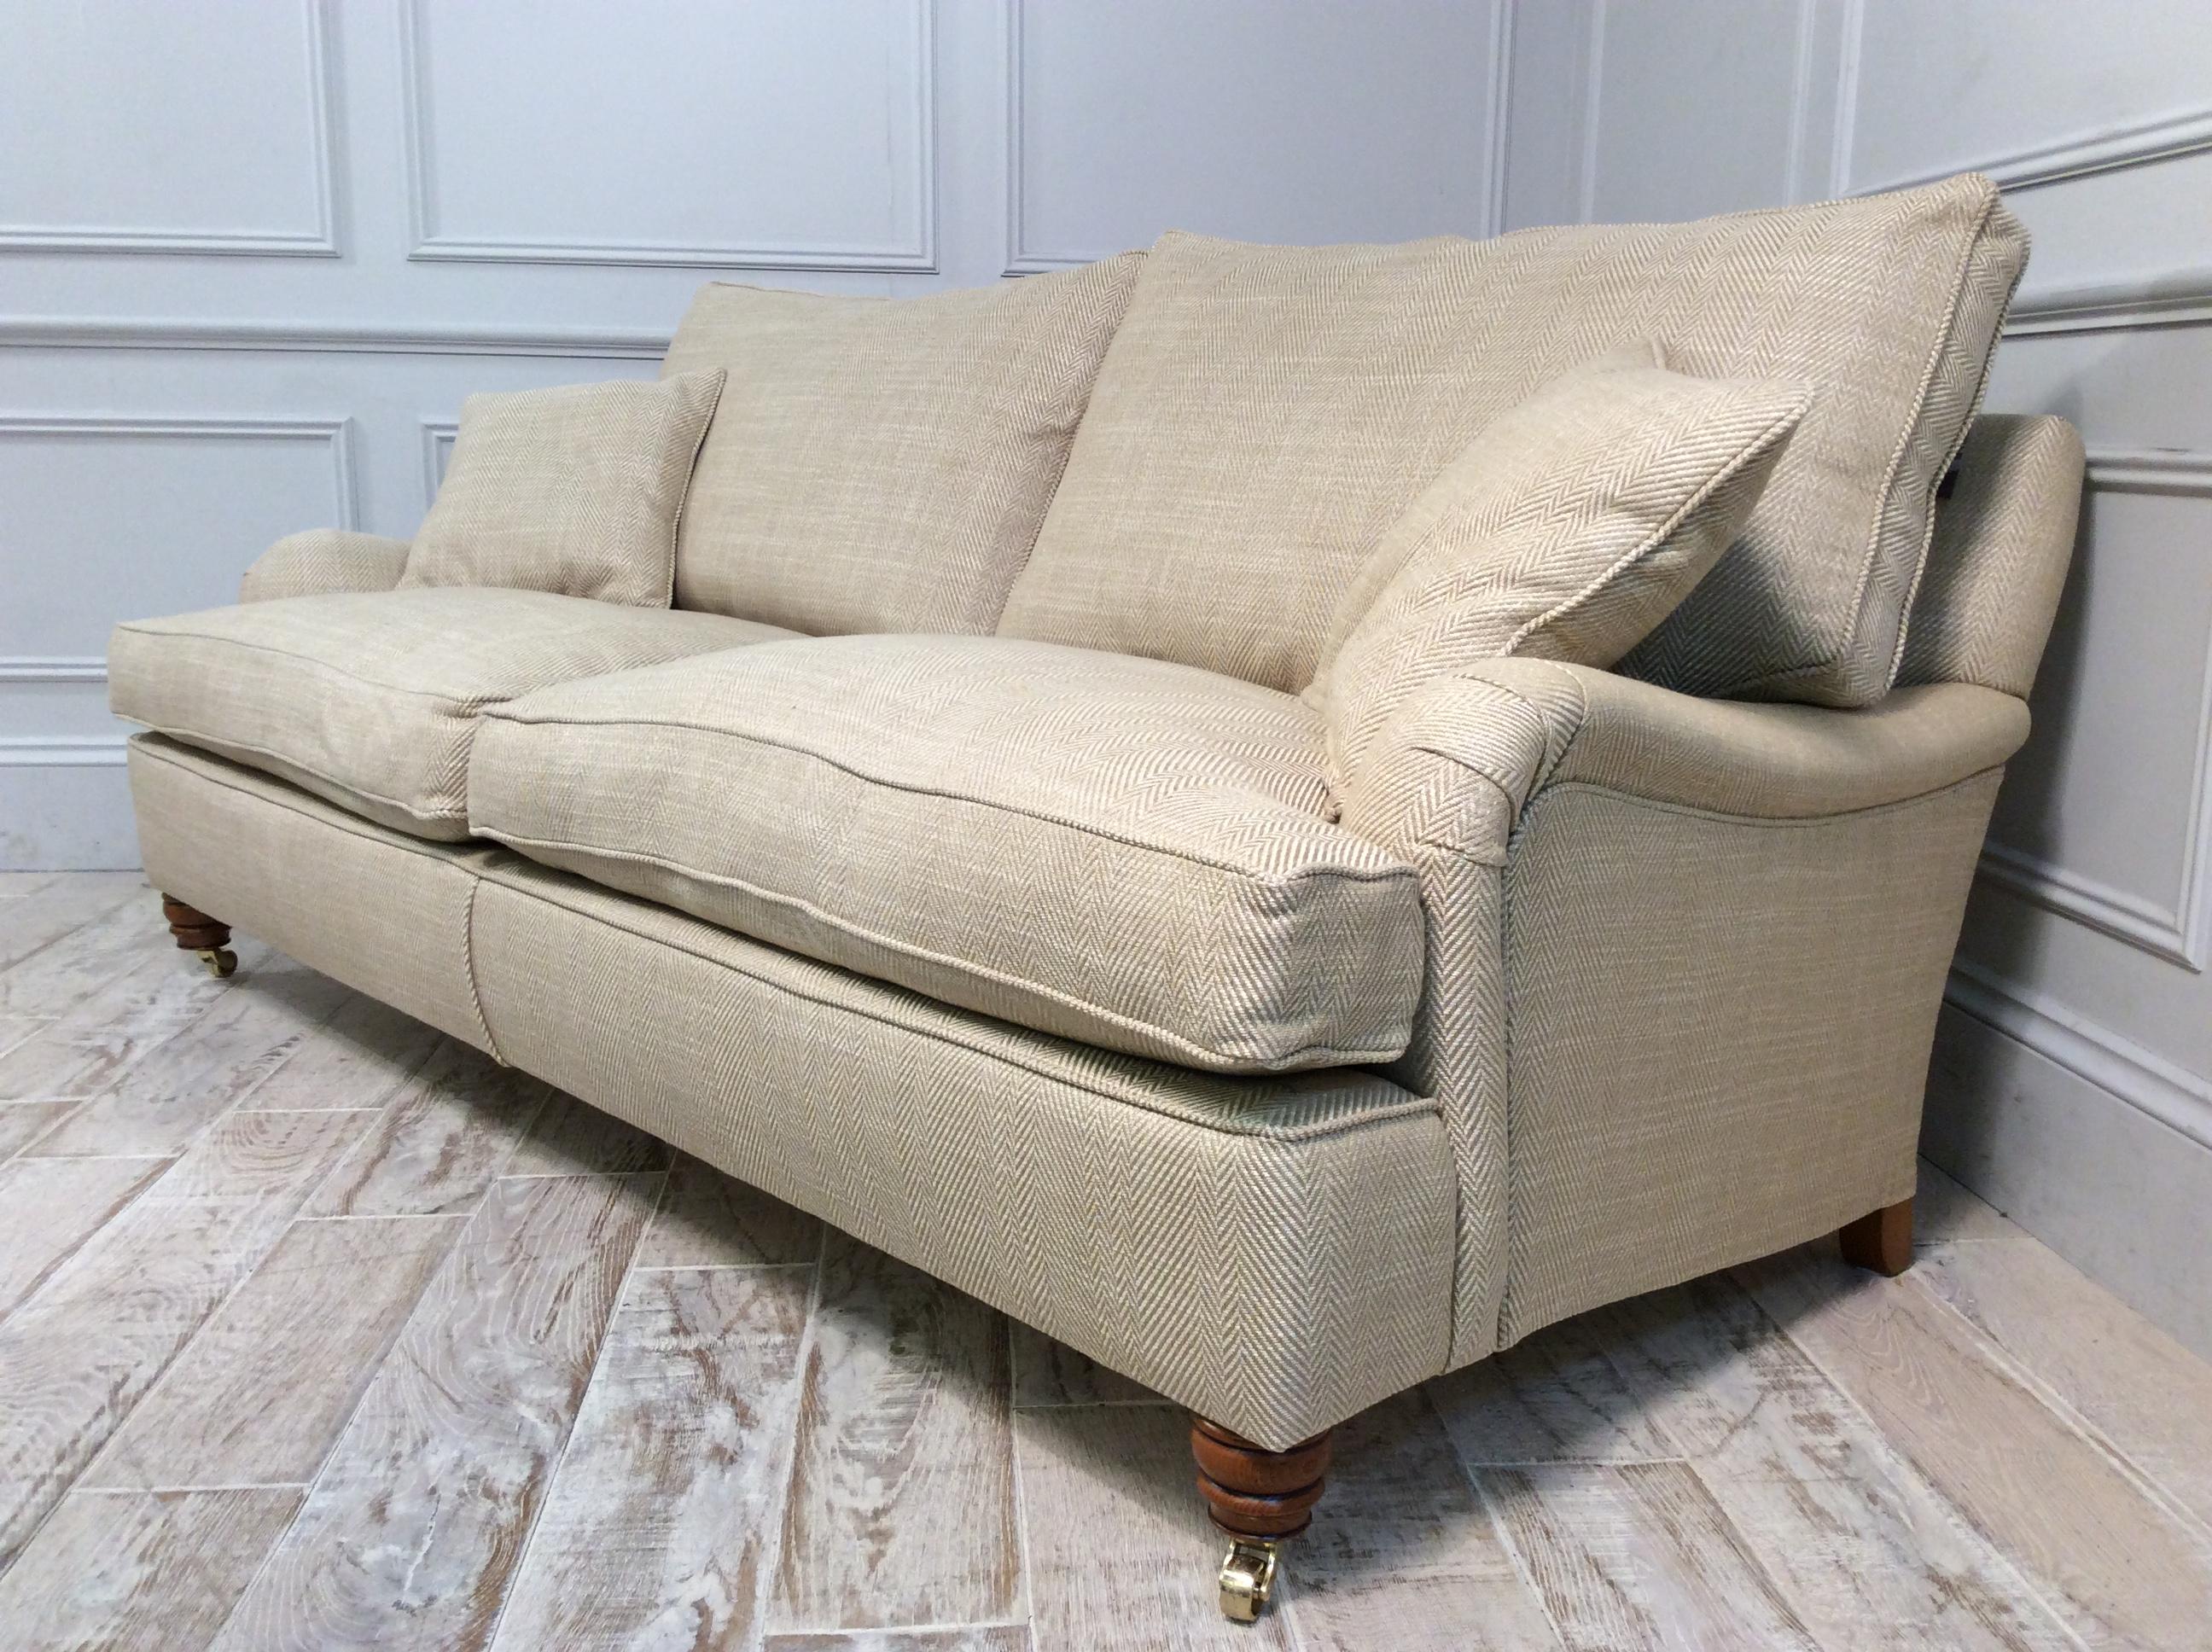 Product photograph showing Duresta Lansdowne 3 Seater Fabric Sofa In Rupert Linen